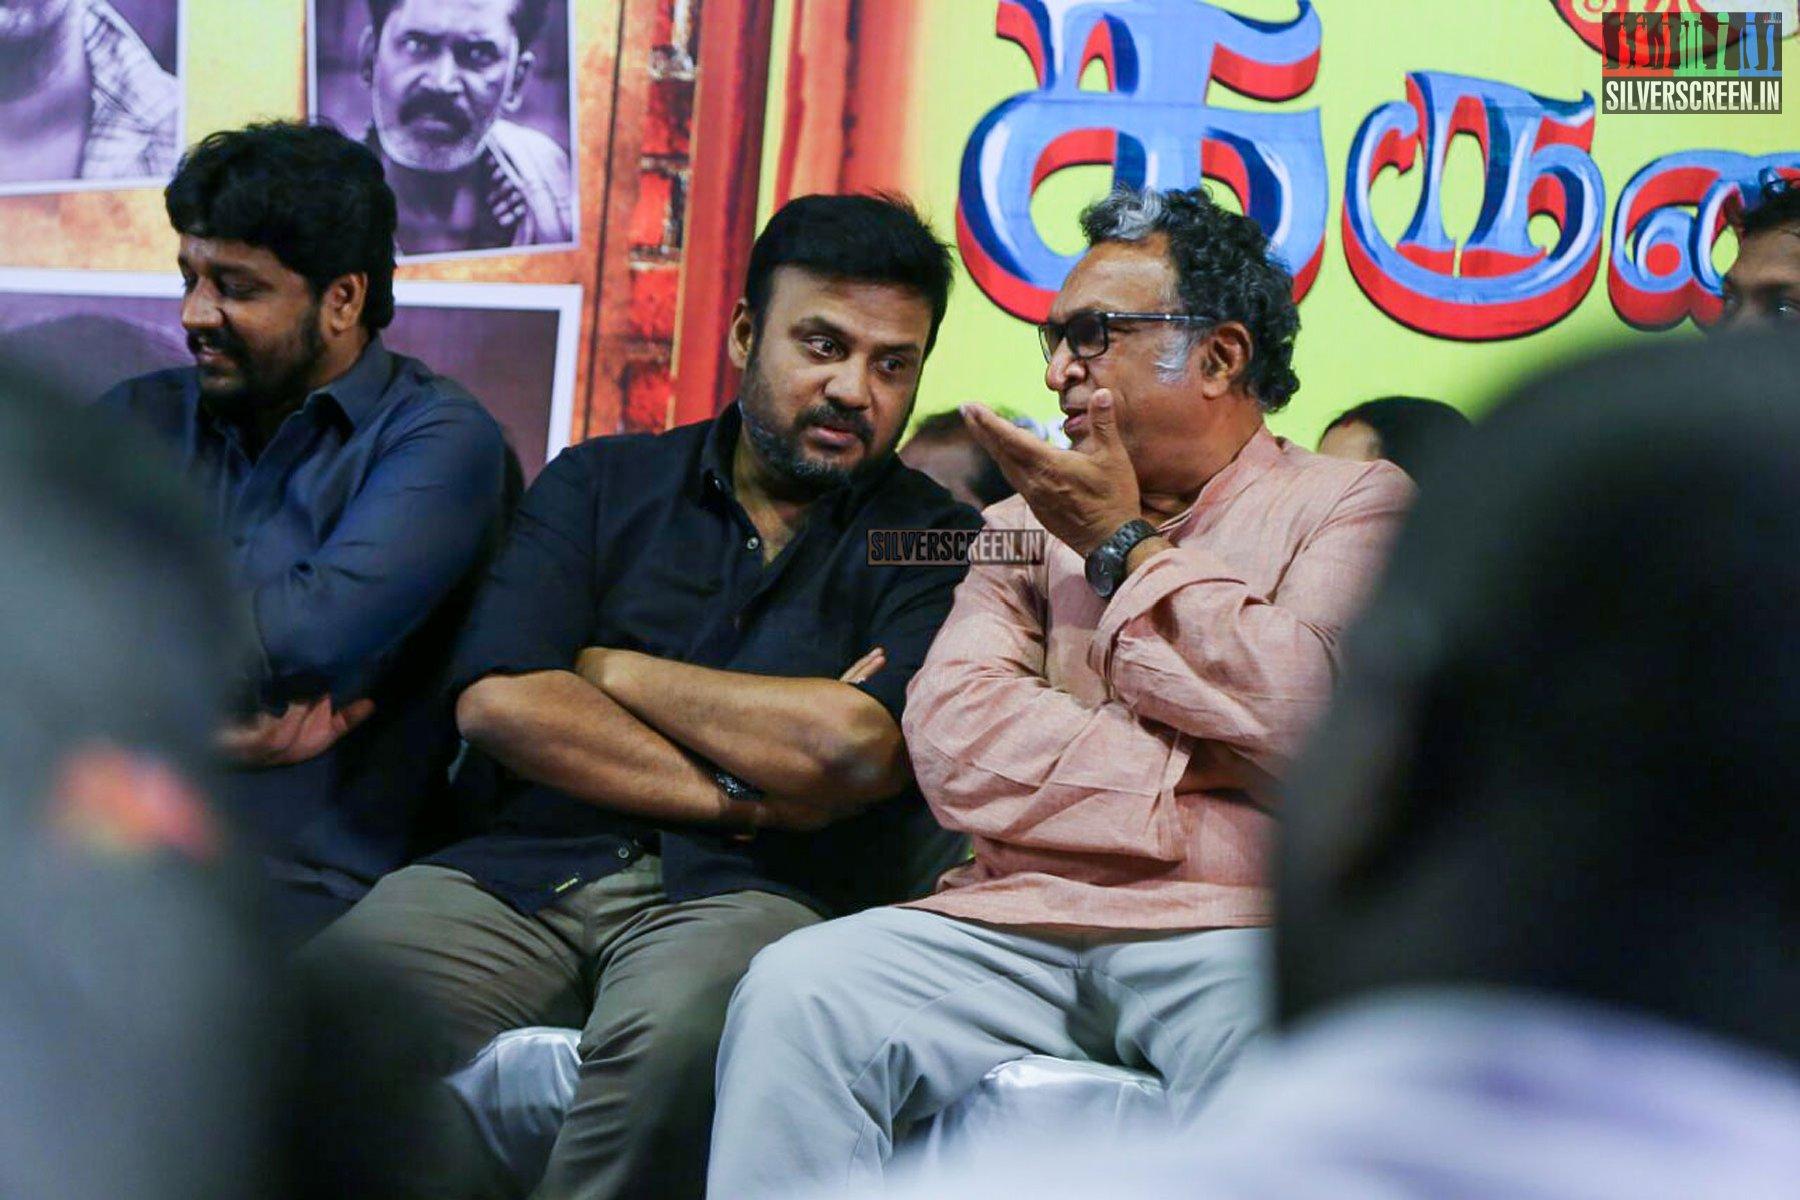 In Pictures: Oru Kidayin Karunai Manu Audio Launch with Vidharth and